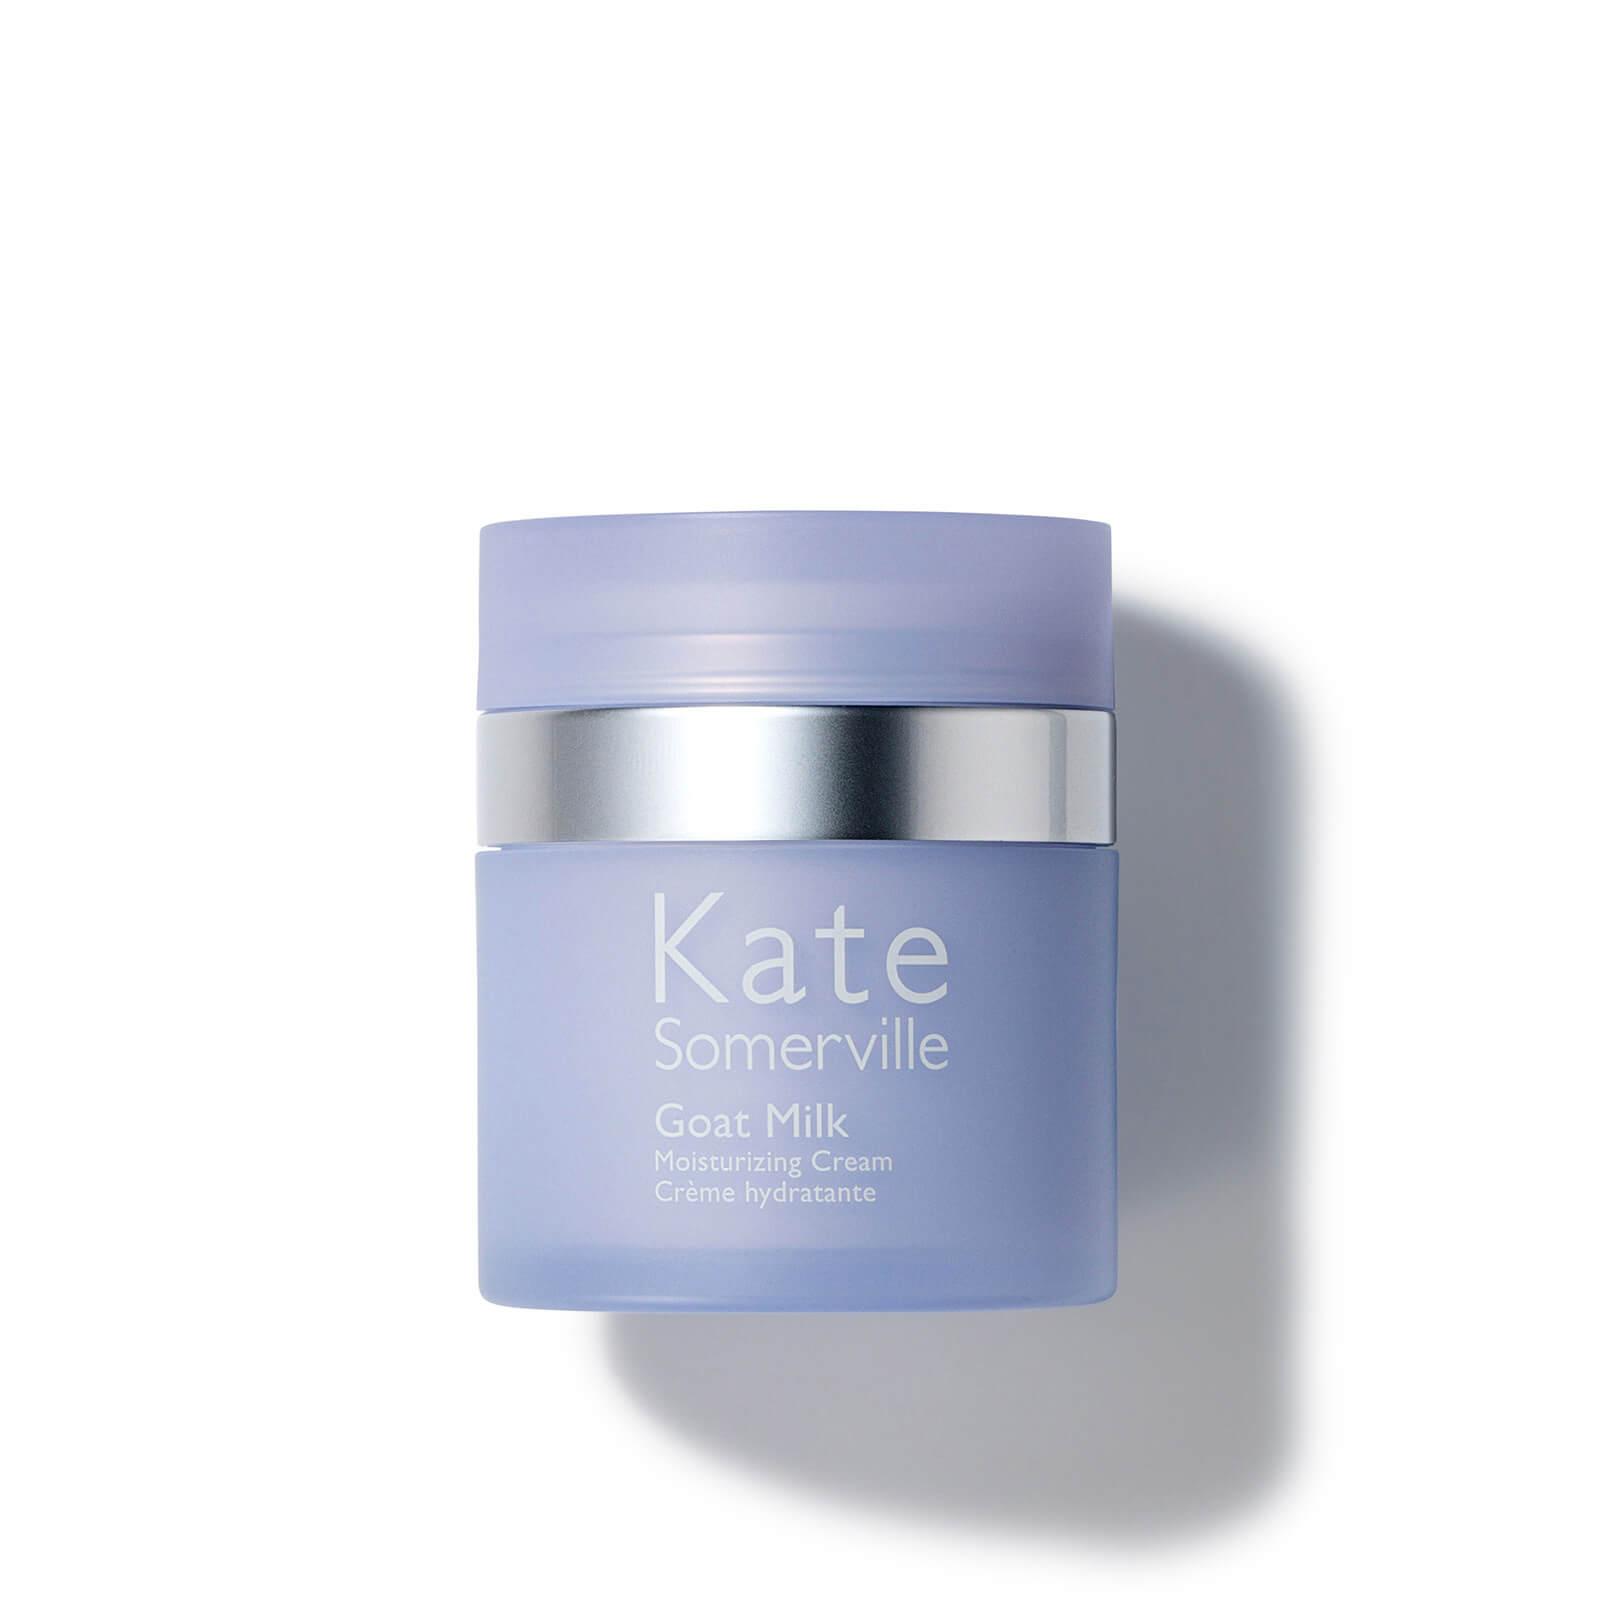 Купить Kate Somerville Goat Milk Moisturizing Cream 50ml